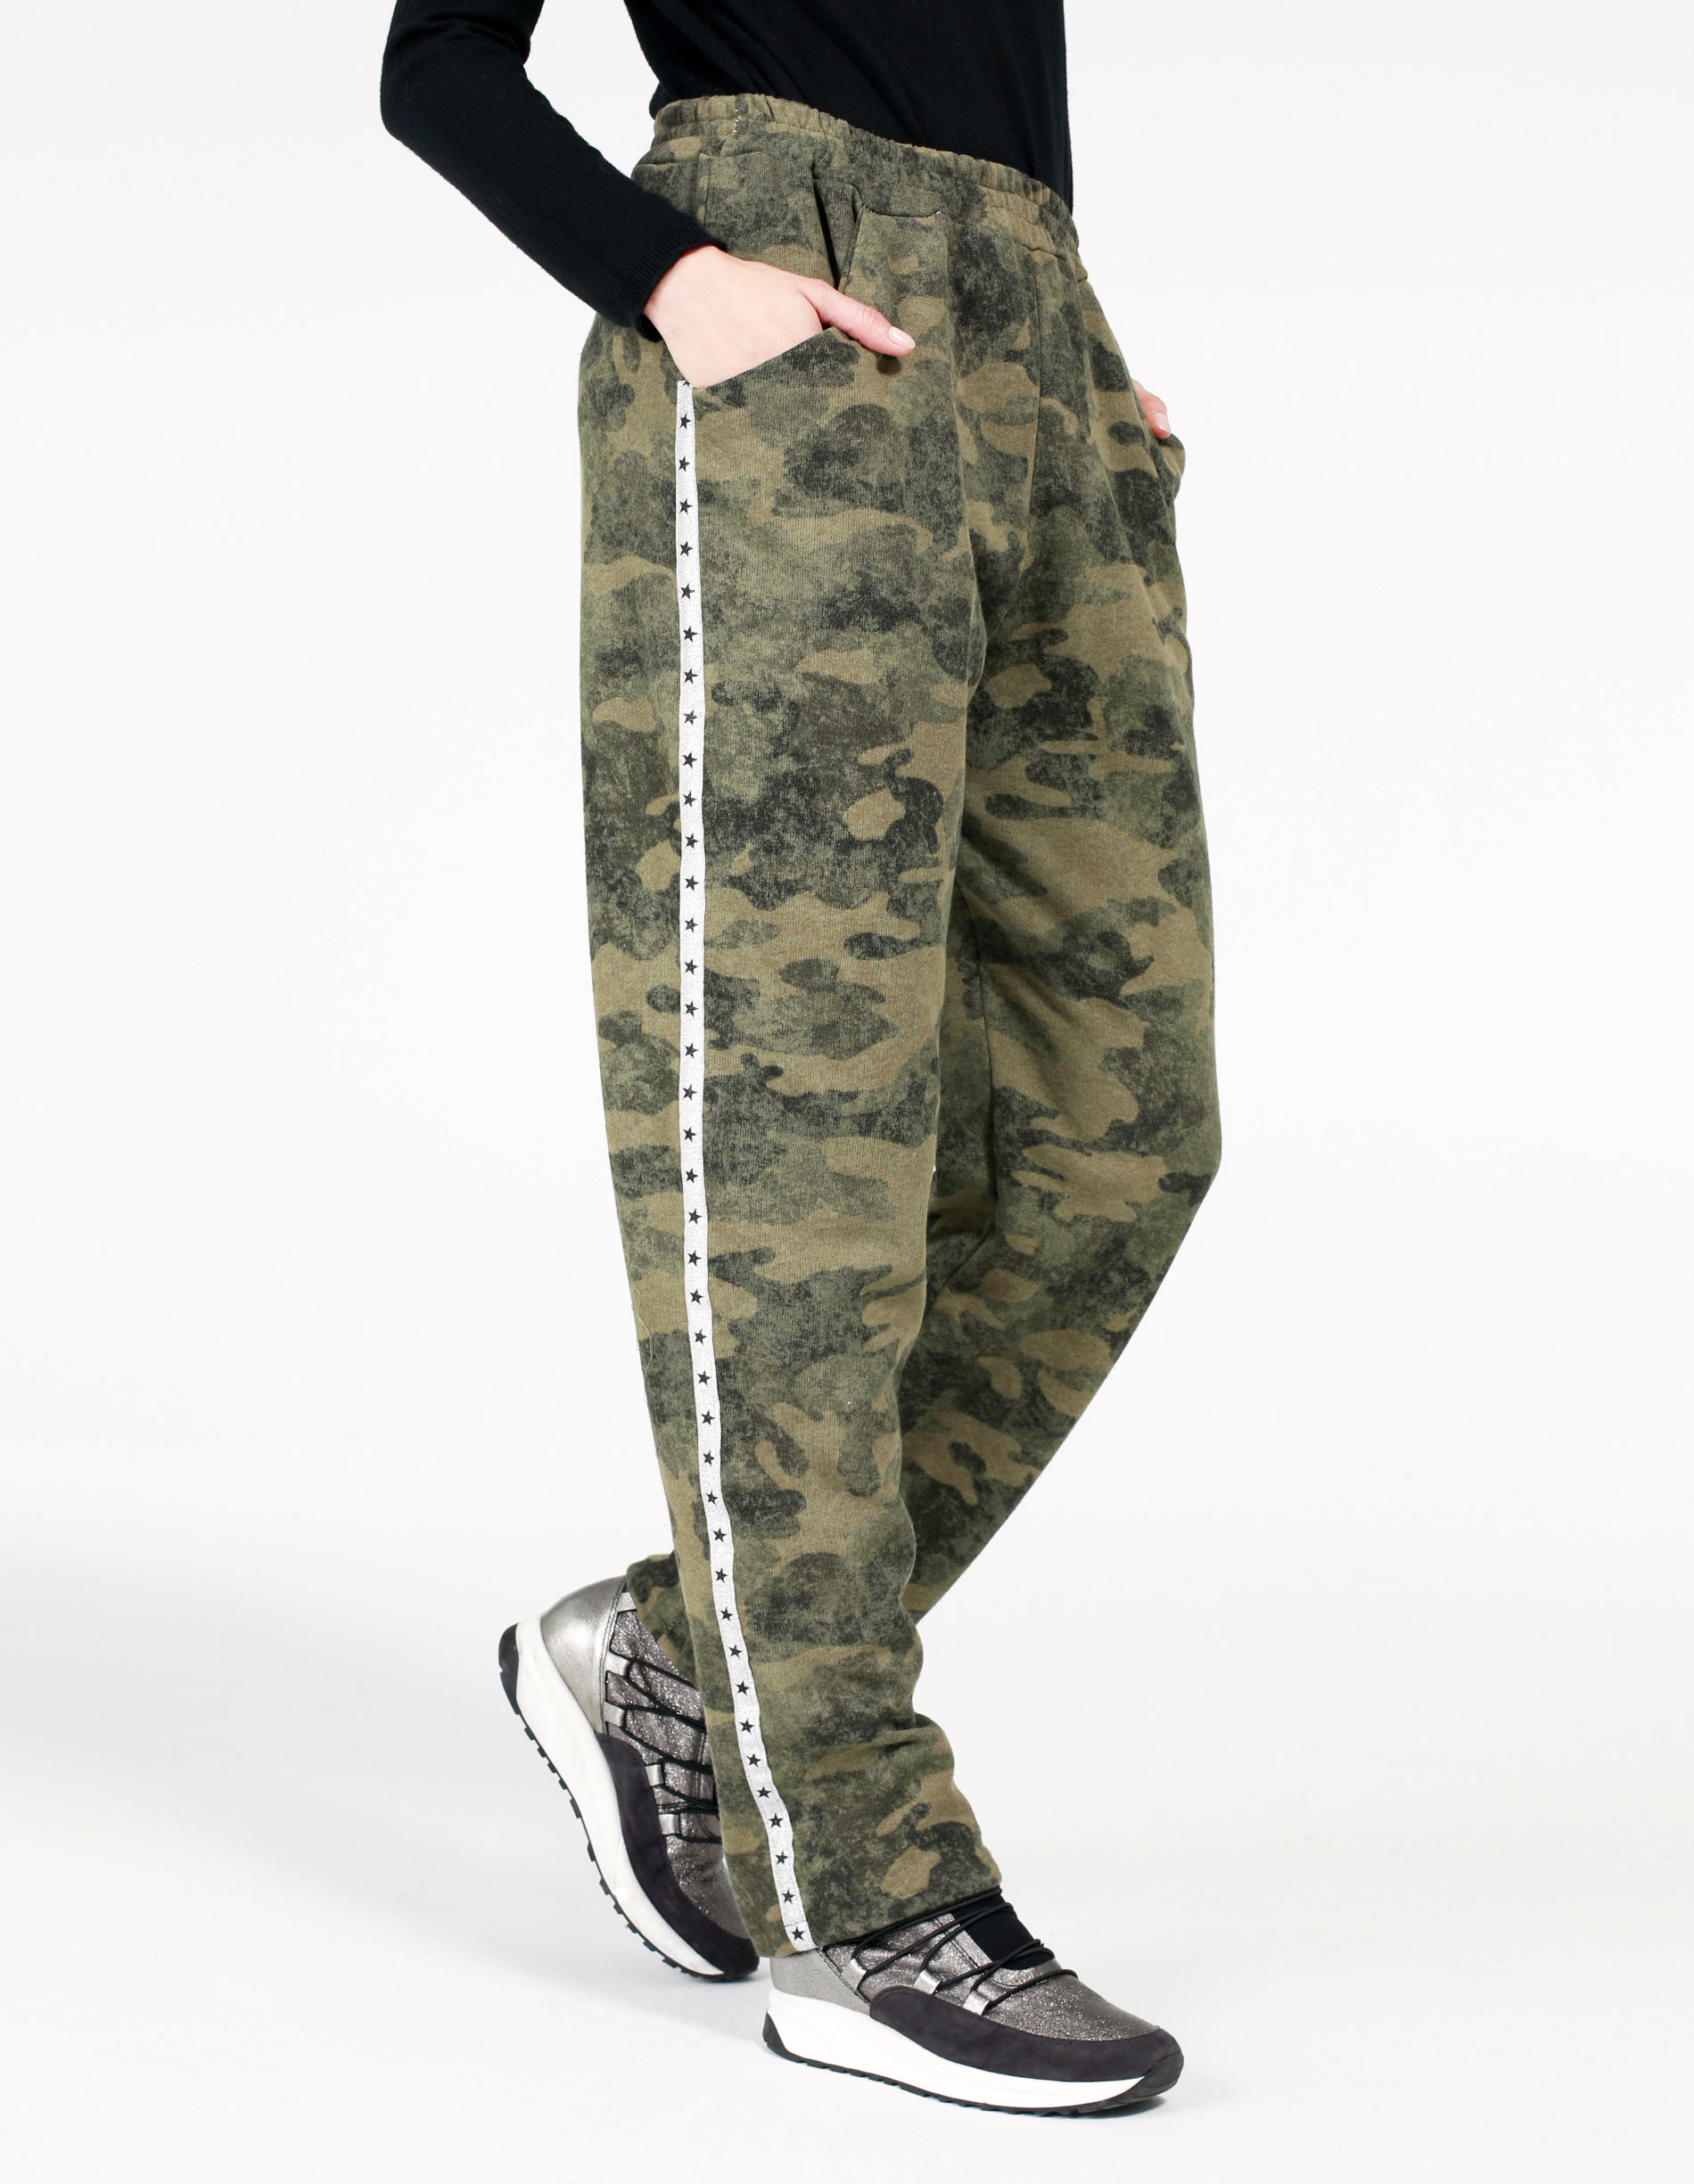 Spodnie - 34-I4058 MILI - Unisono